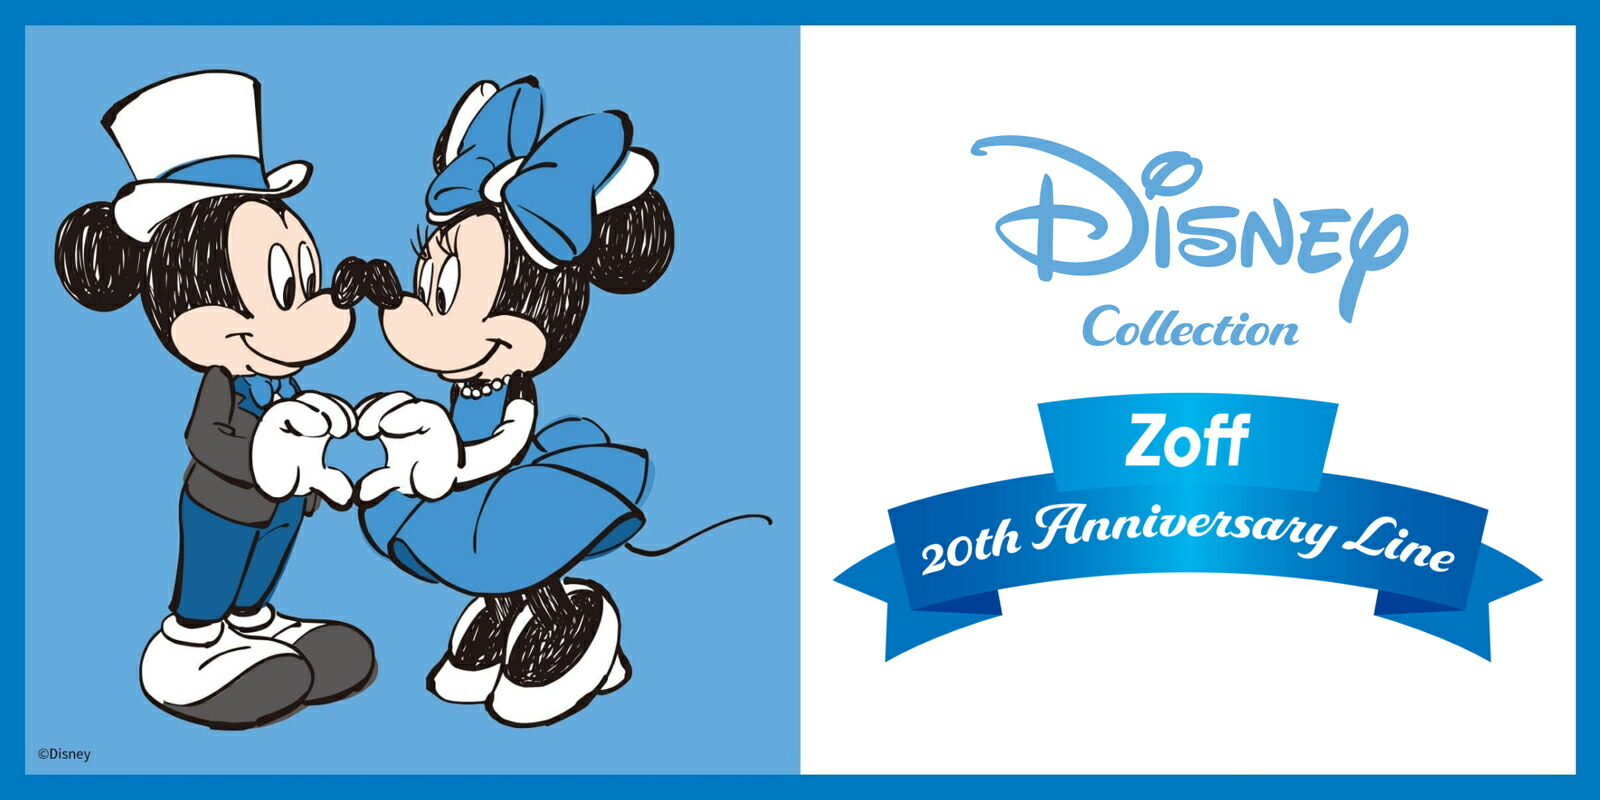 Zoff 20th Anniversary Line